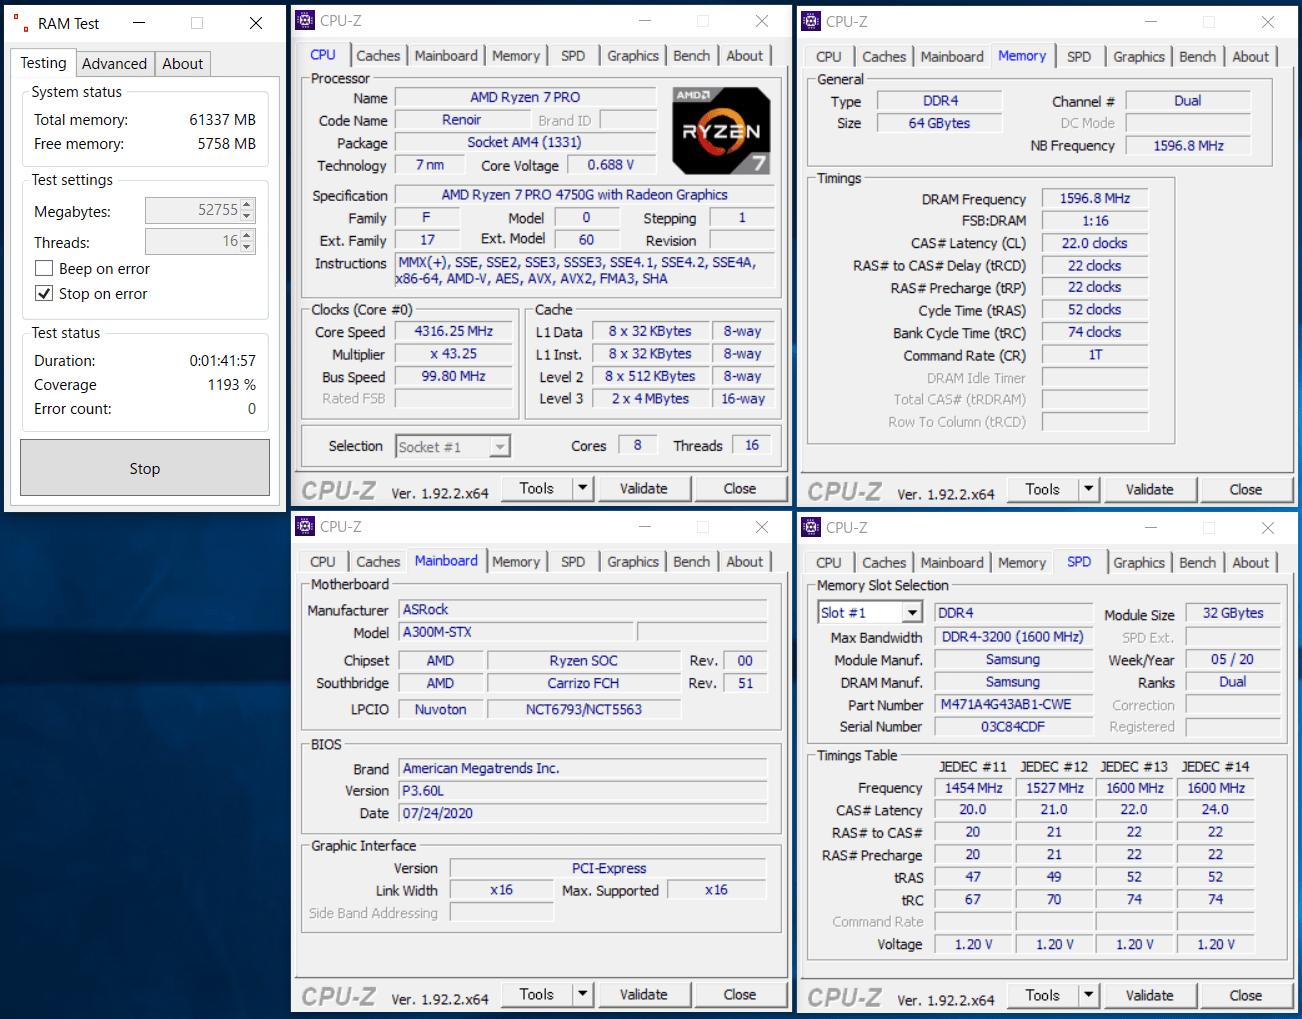 AMD Ryzen 7 PRO 4750G_Deskmini A300_ramtest_AU